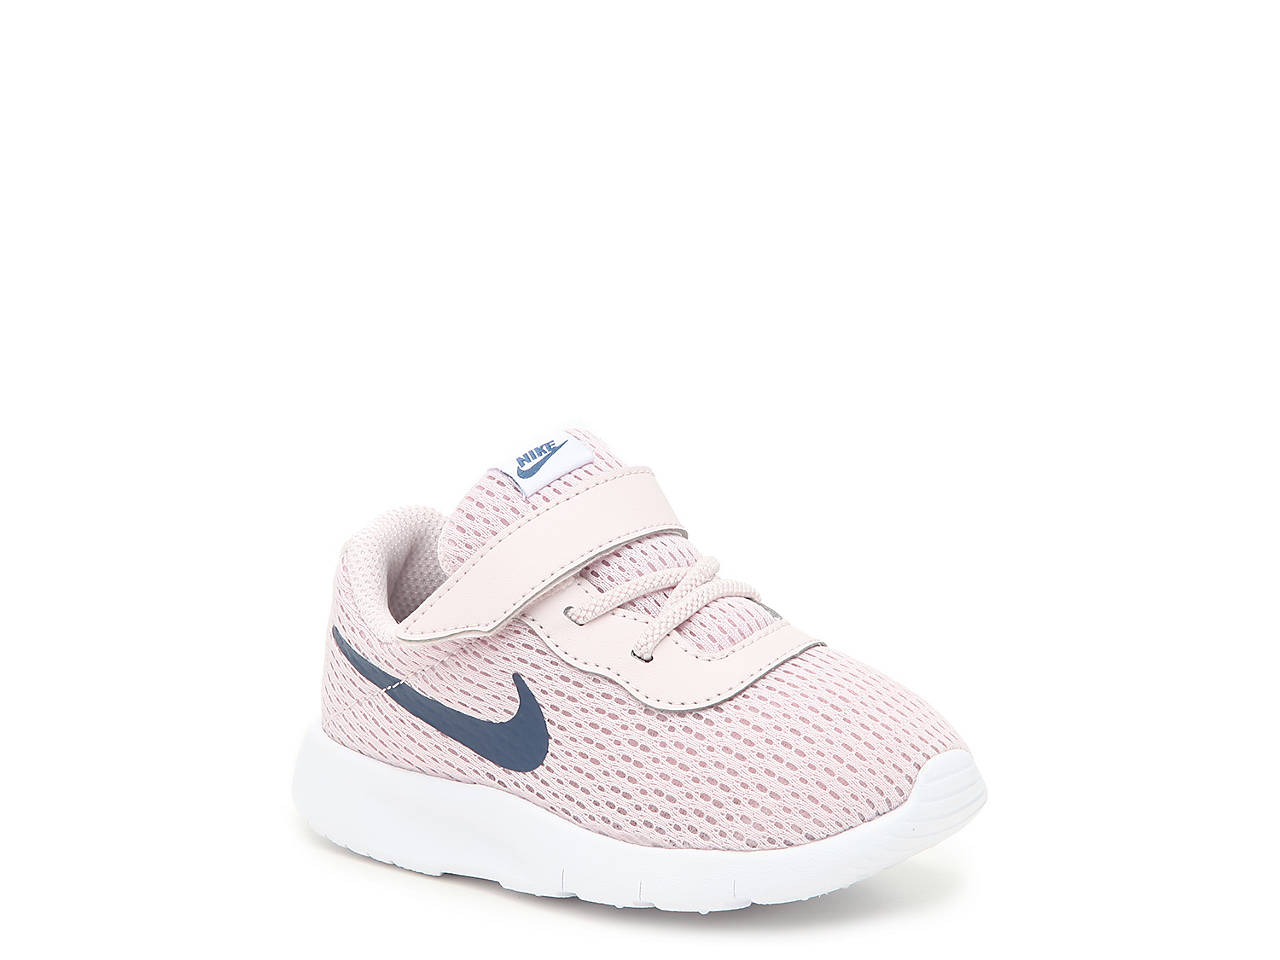 f2315149acdeac Nike Tanjun Infant   Toddler Sneaker Kids Shoes